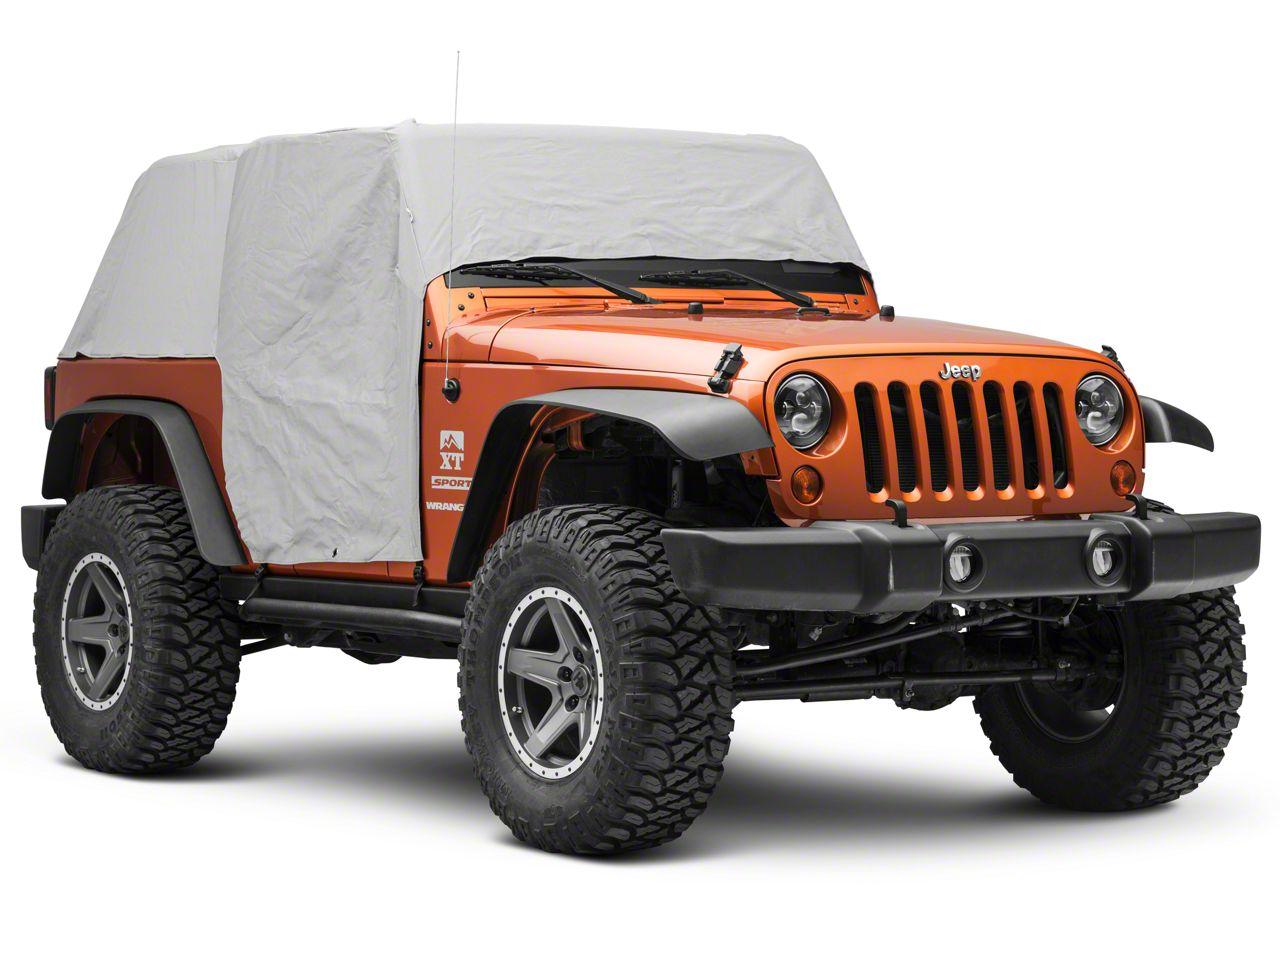 Jeep Wrangler JK 4-türer Full Car Cover Abdeckung Vollgarage Grau 07-18